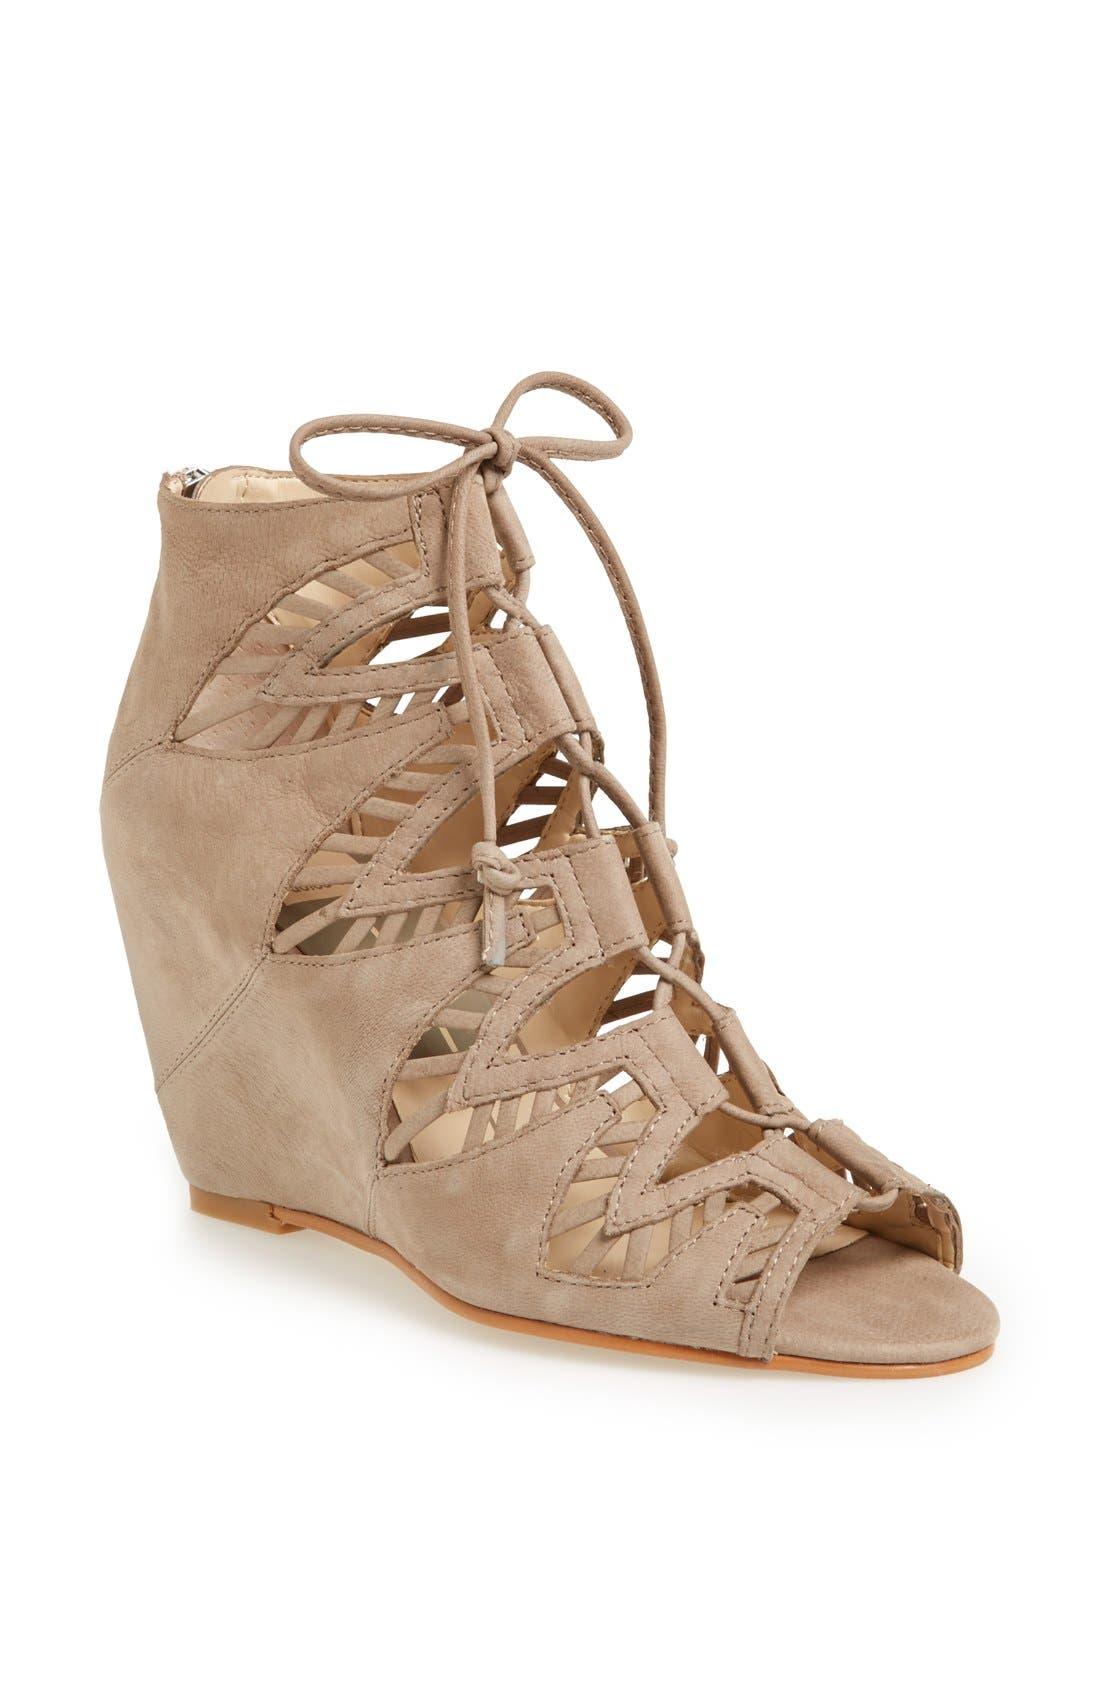 Alternate Image 1 Selected - Dolce Vita 'Shandy' Sandal